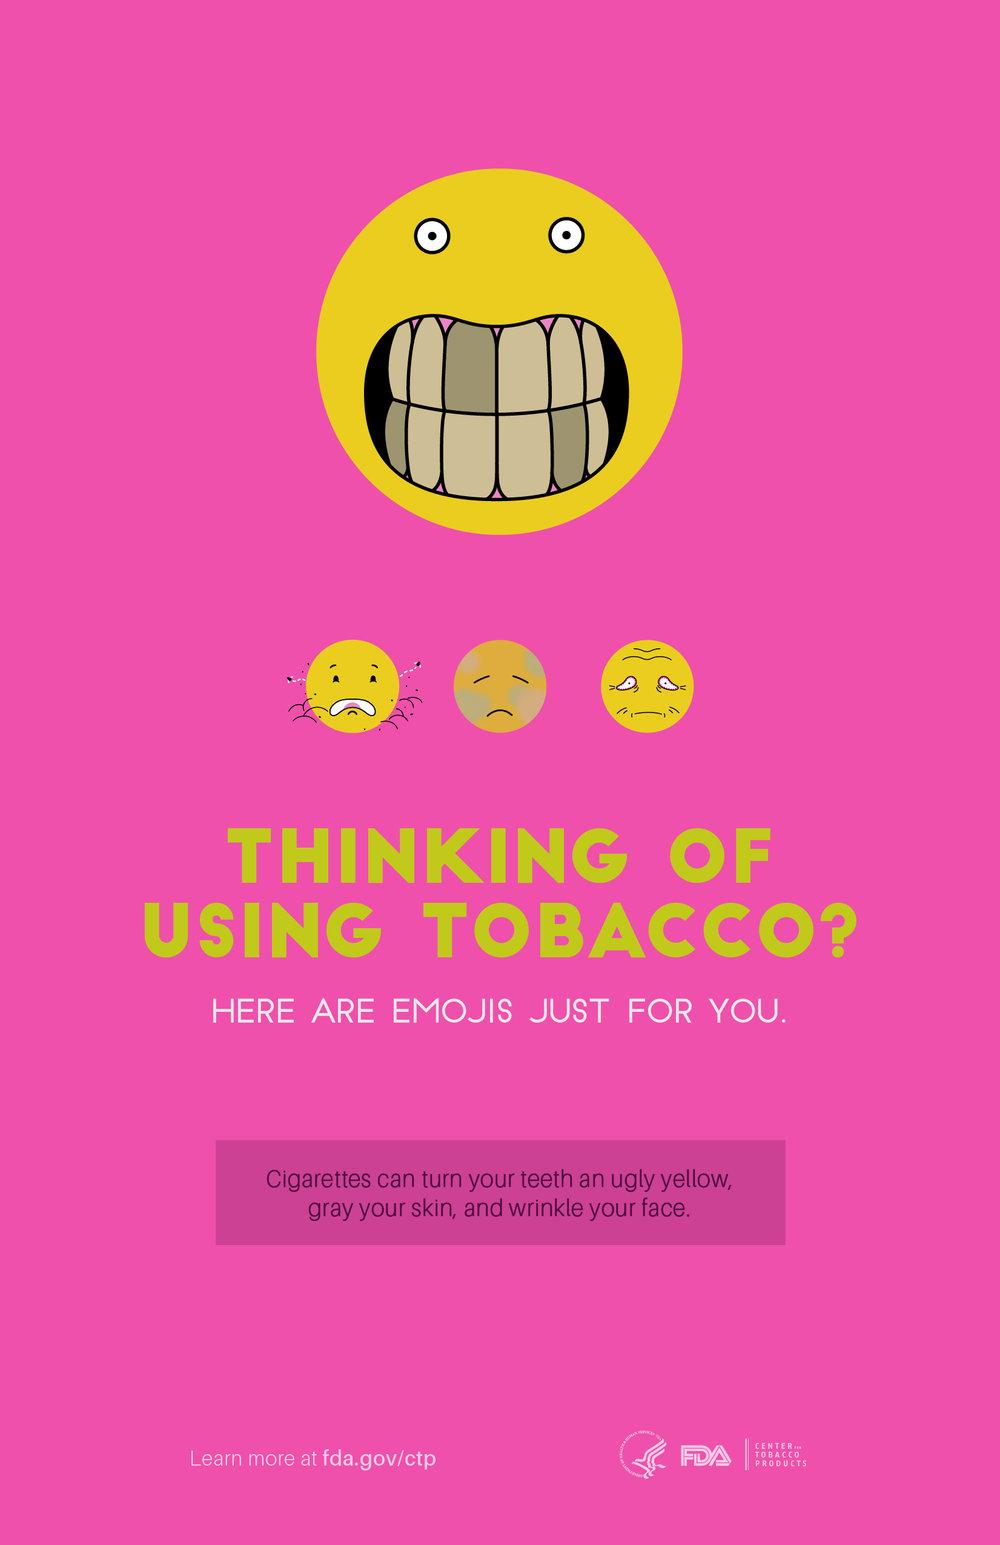 FDA_CTP_Emoji_Cosmetic_v18.jpg